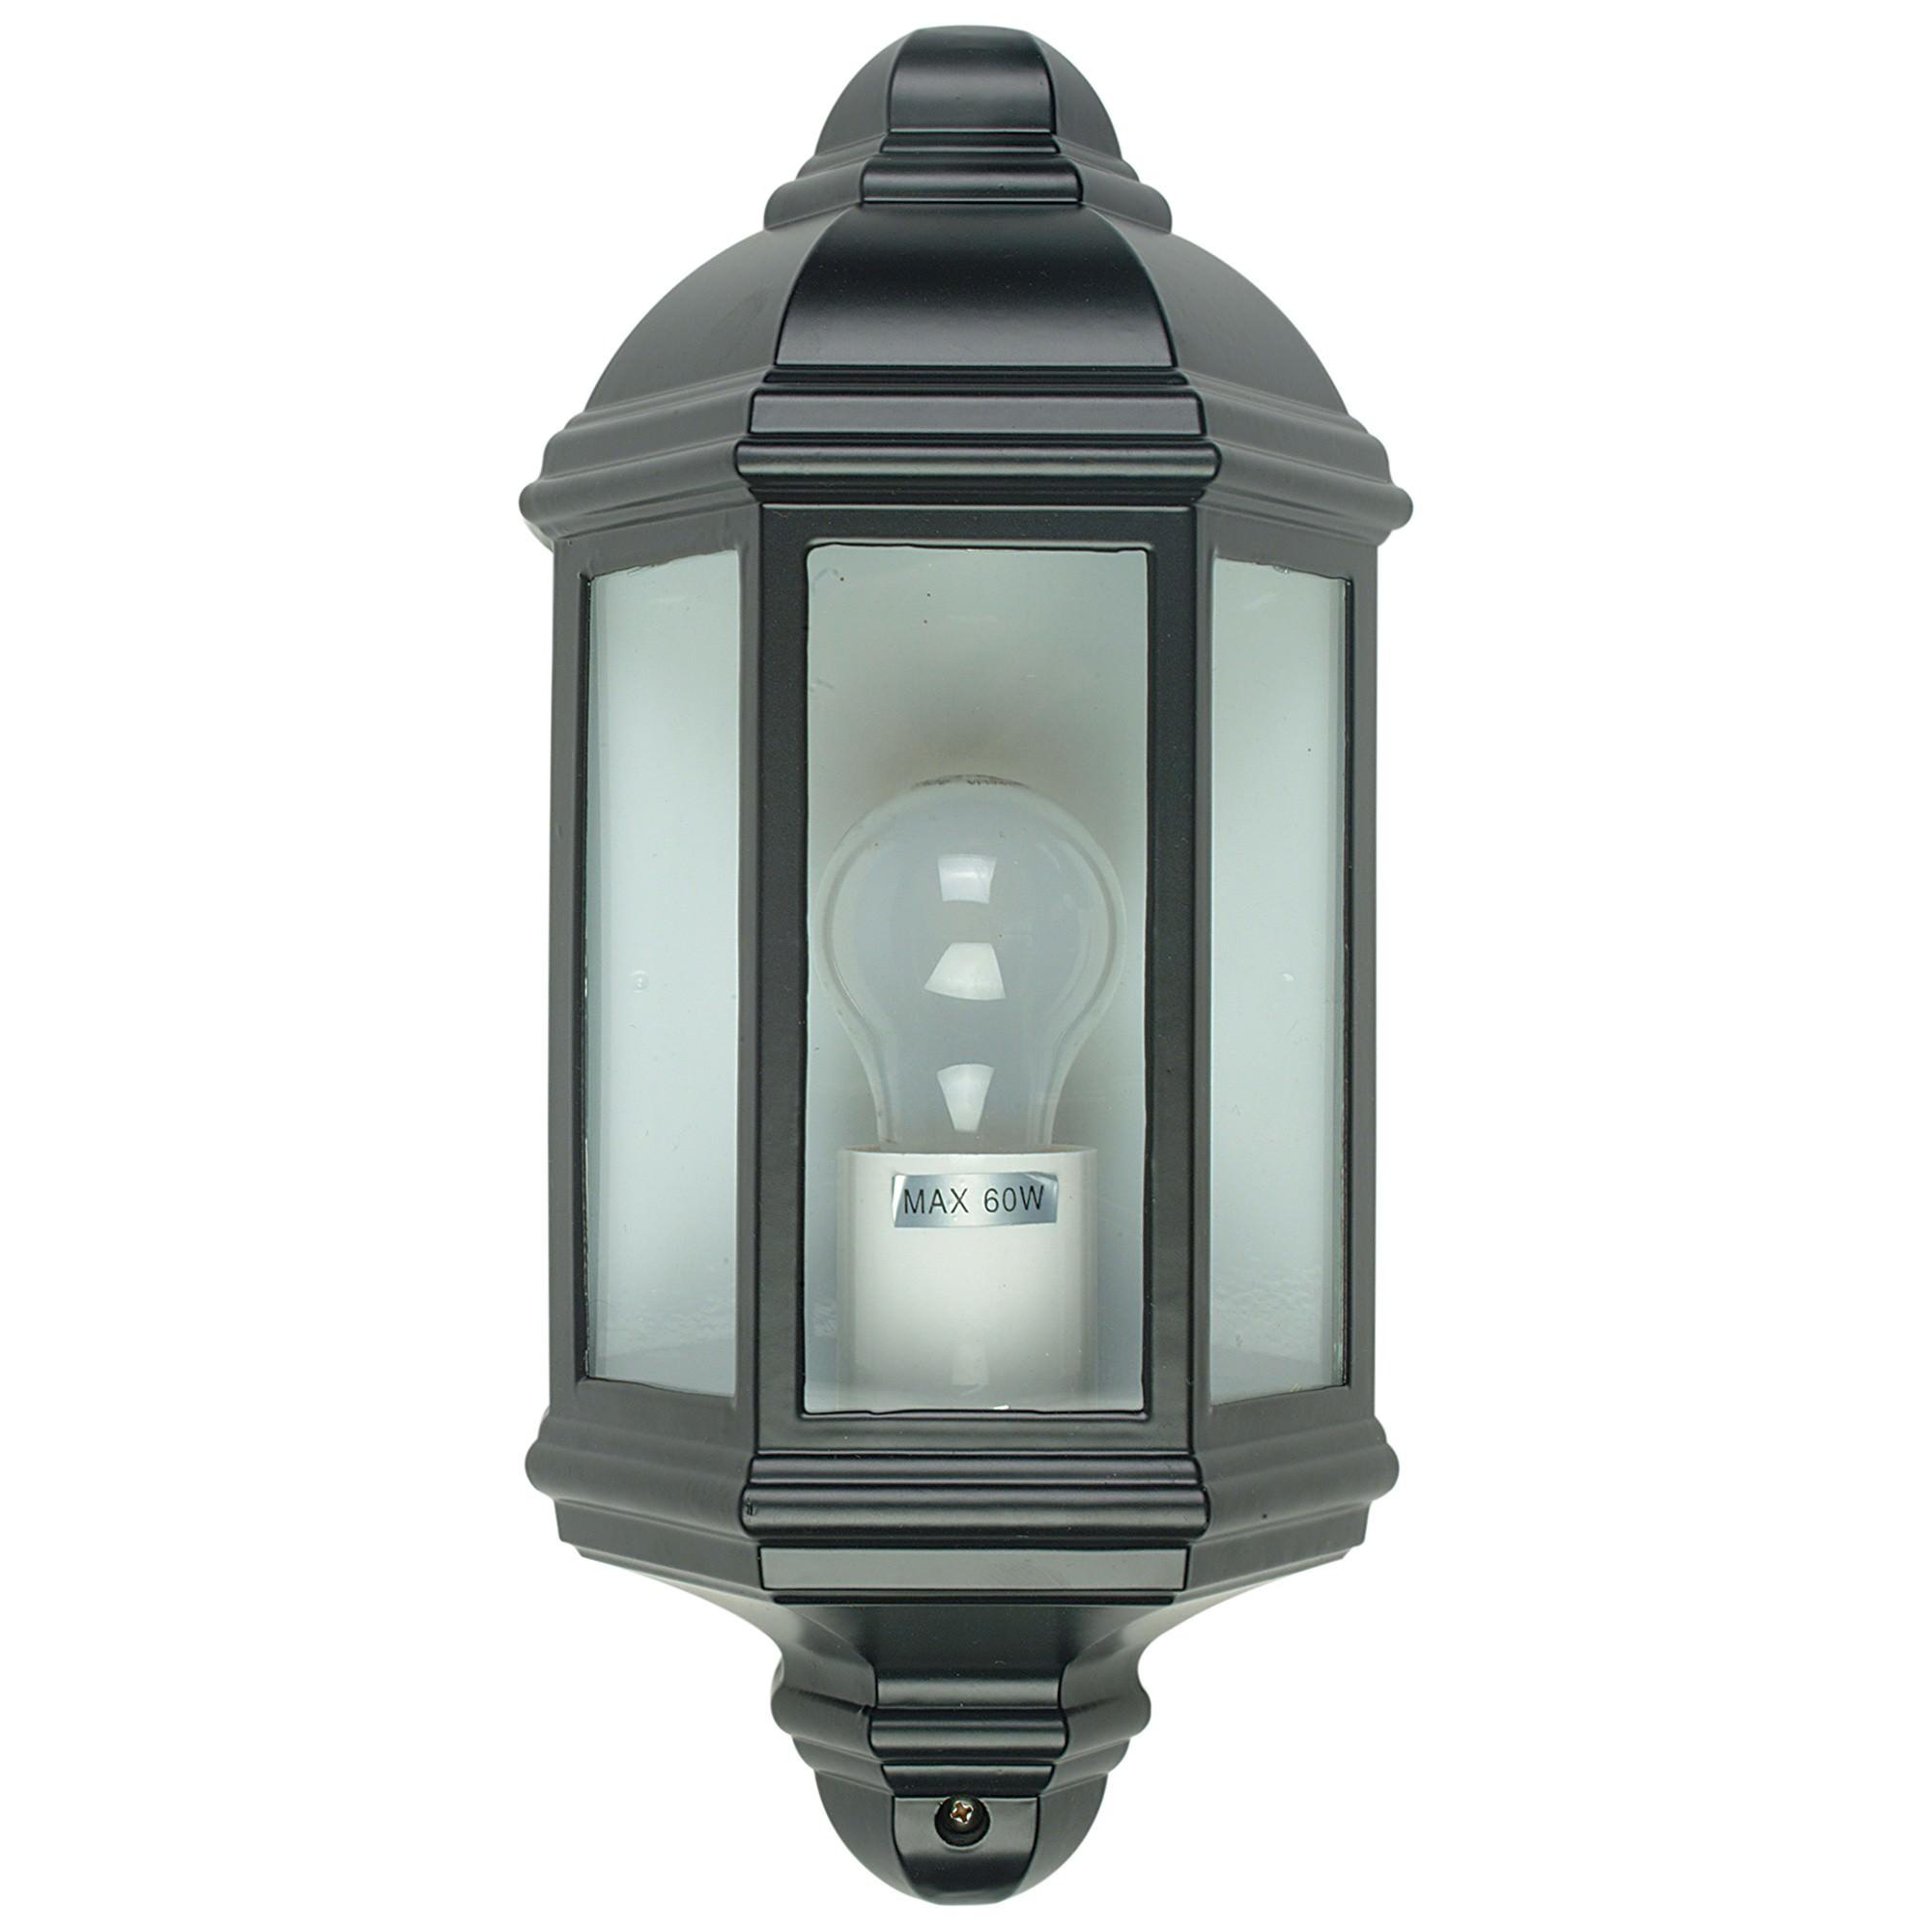 Fenchurch IP44 Exterior Wall Light, Black